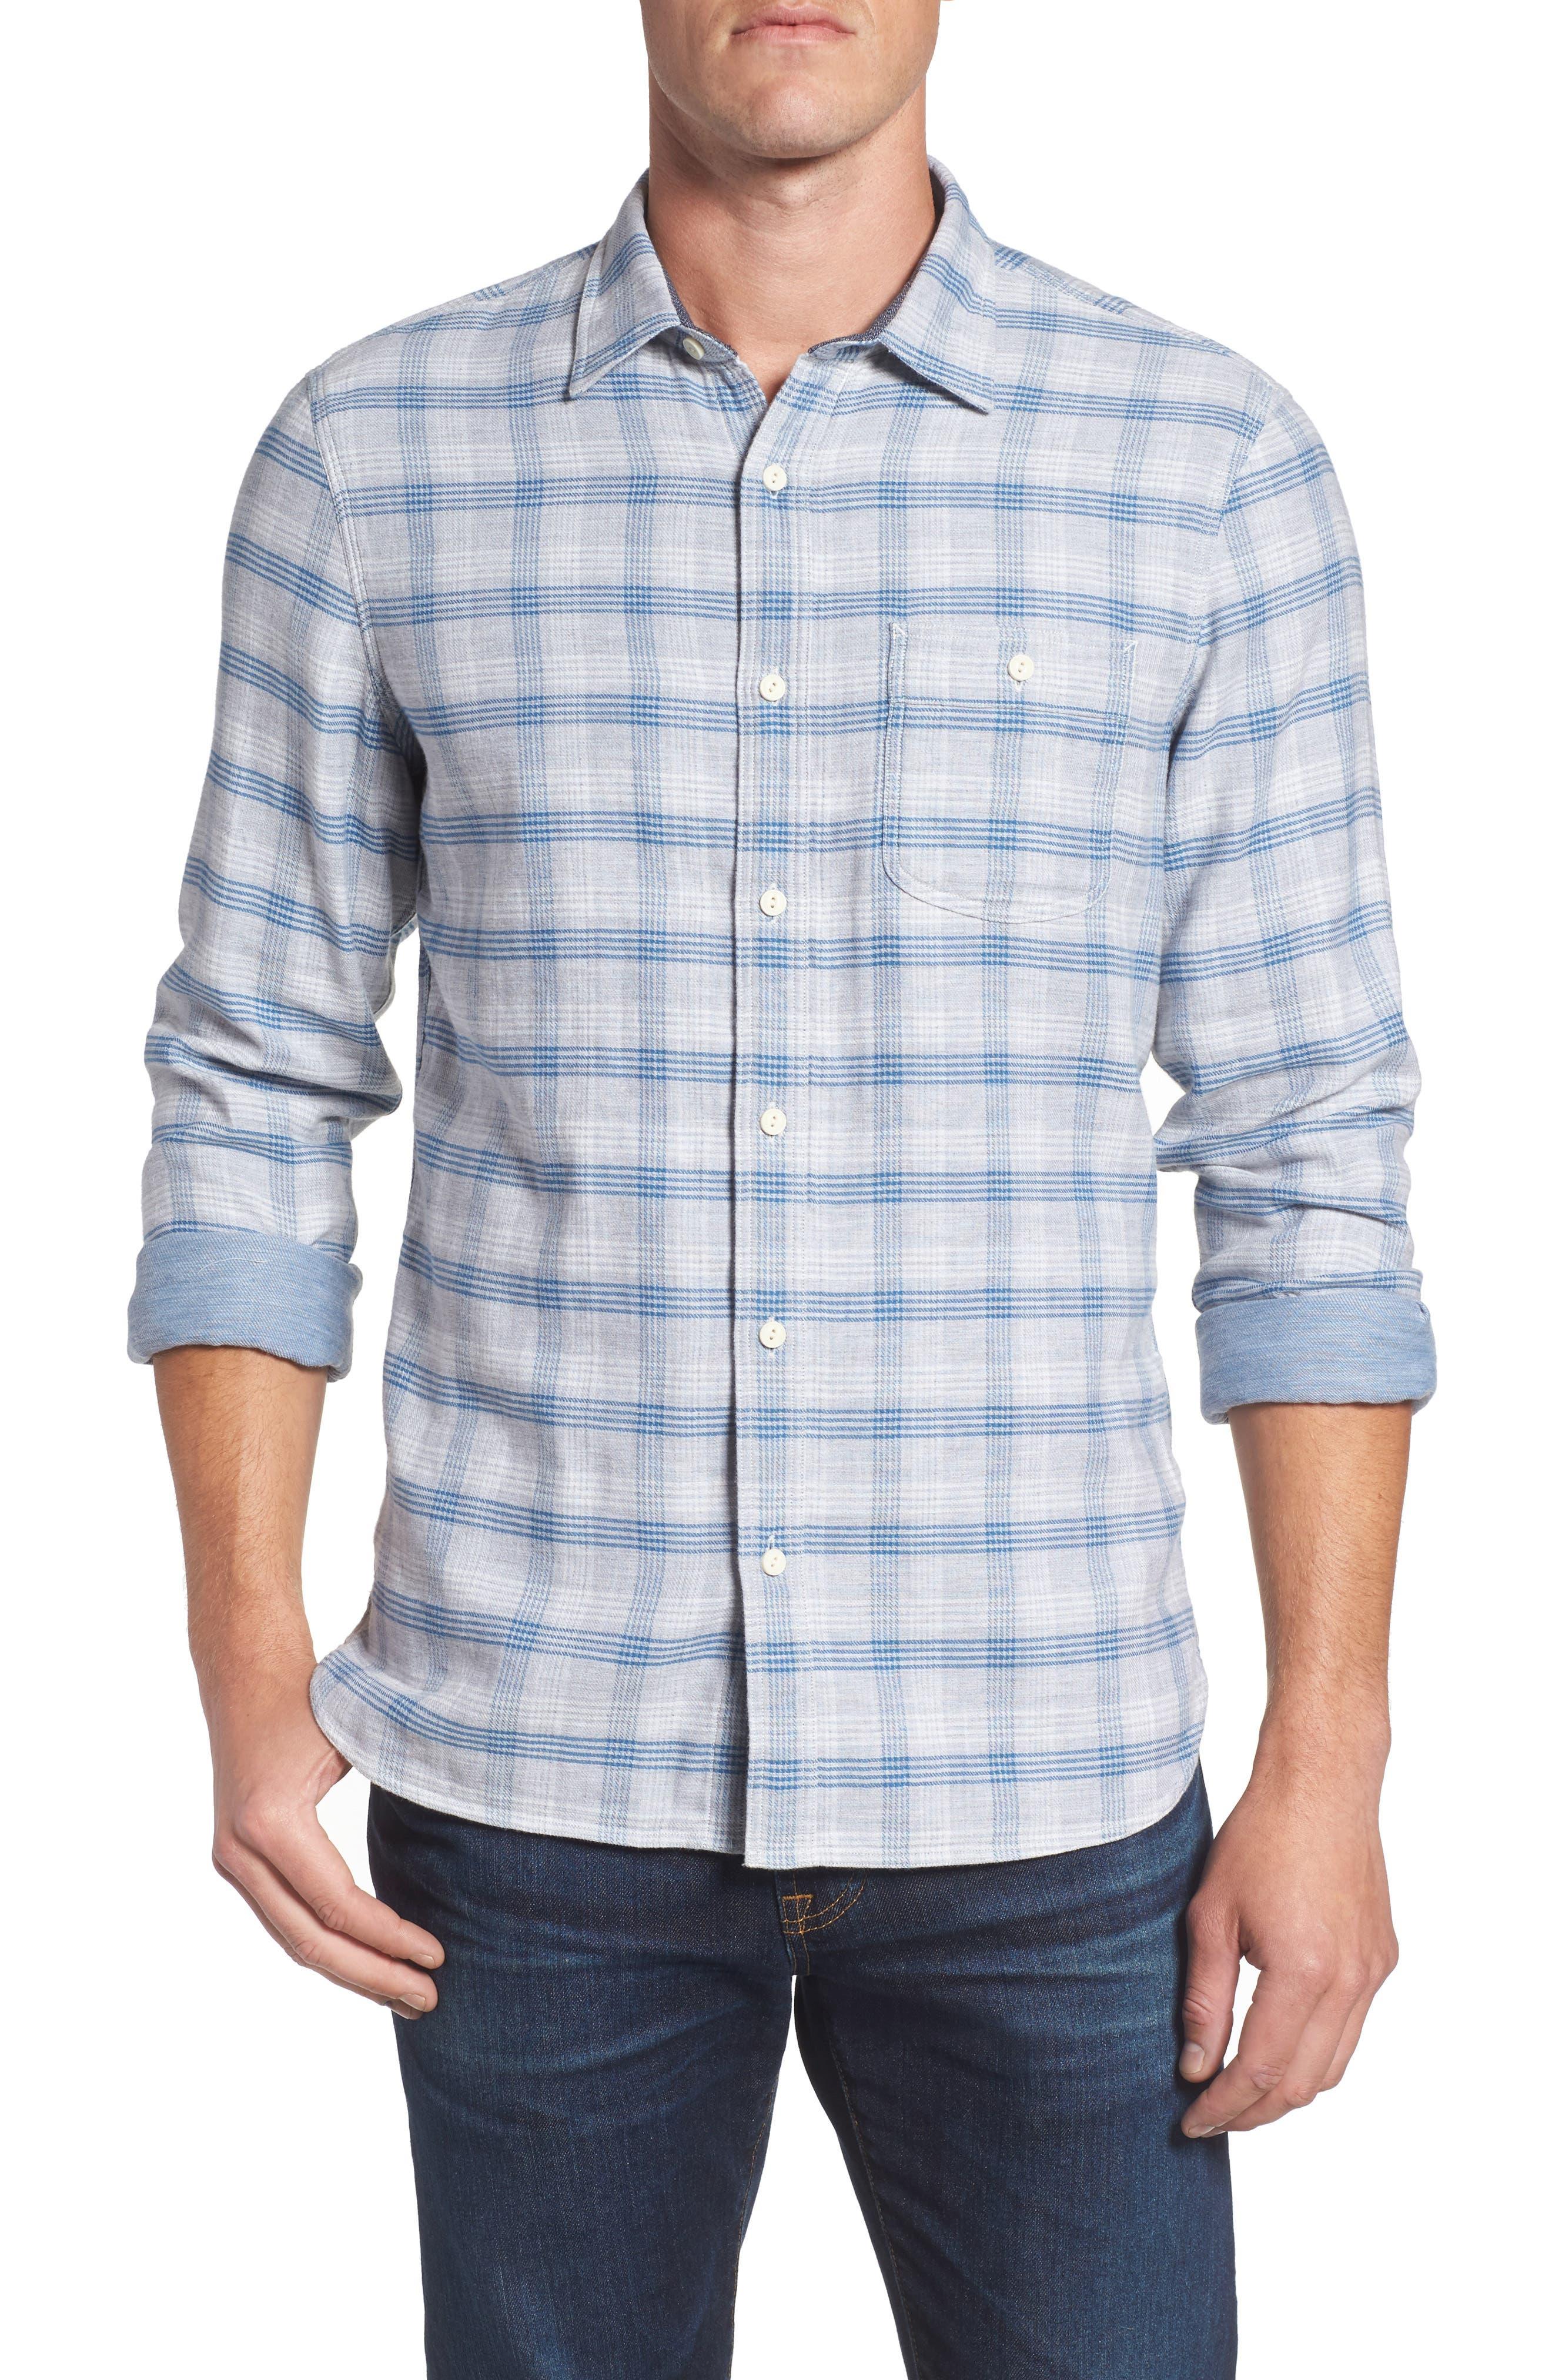 Nordstrom Men's Shop Utility Duofold Trim Fit Sport Shirt (Tall)